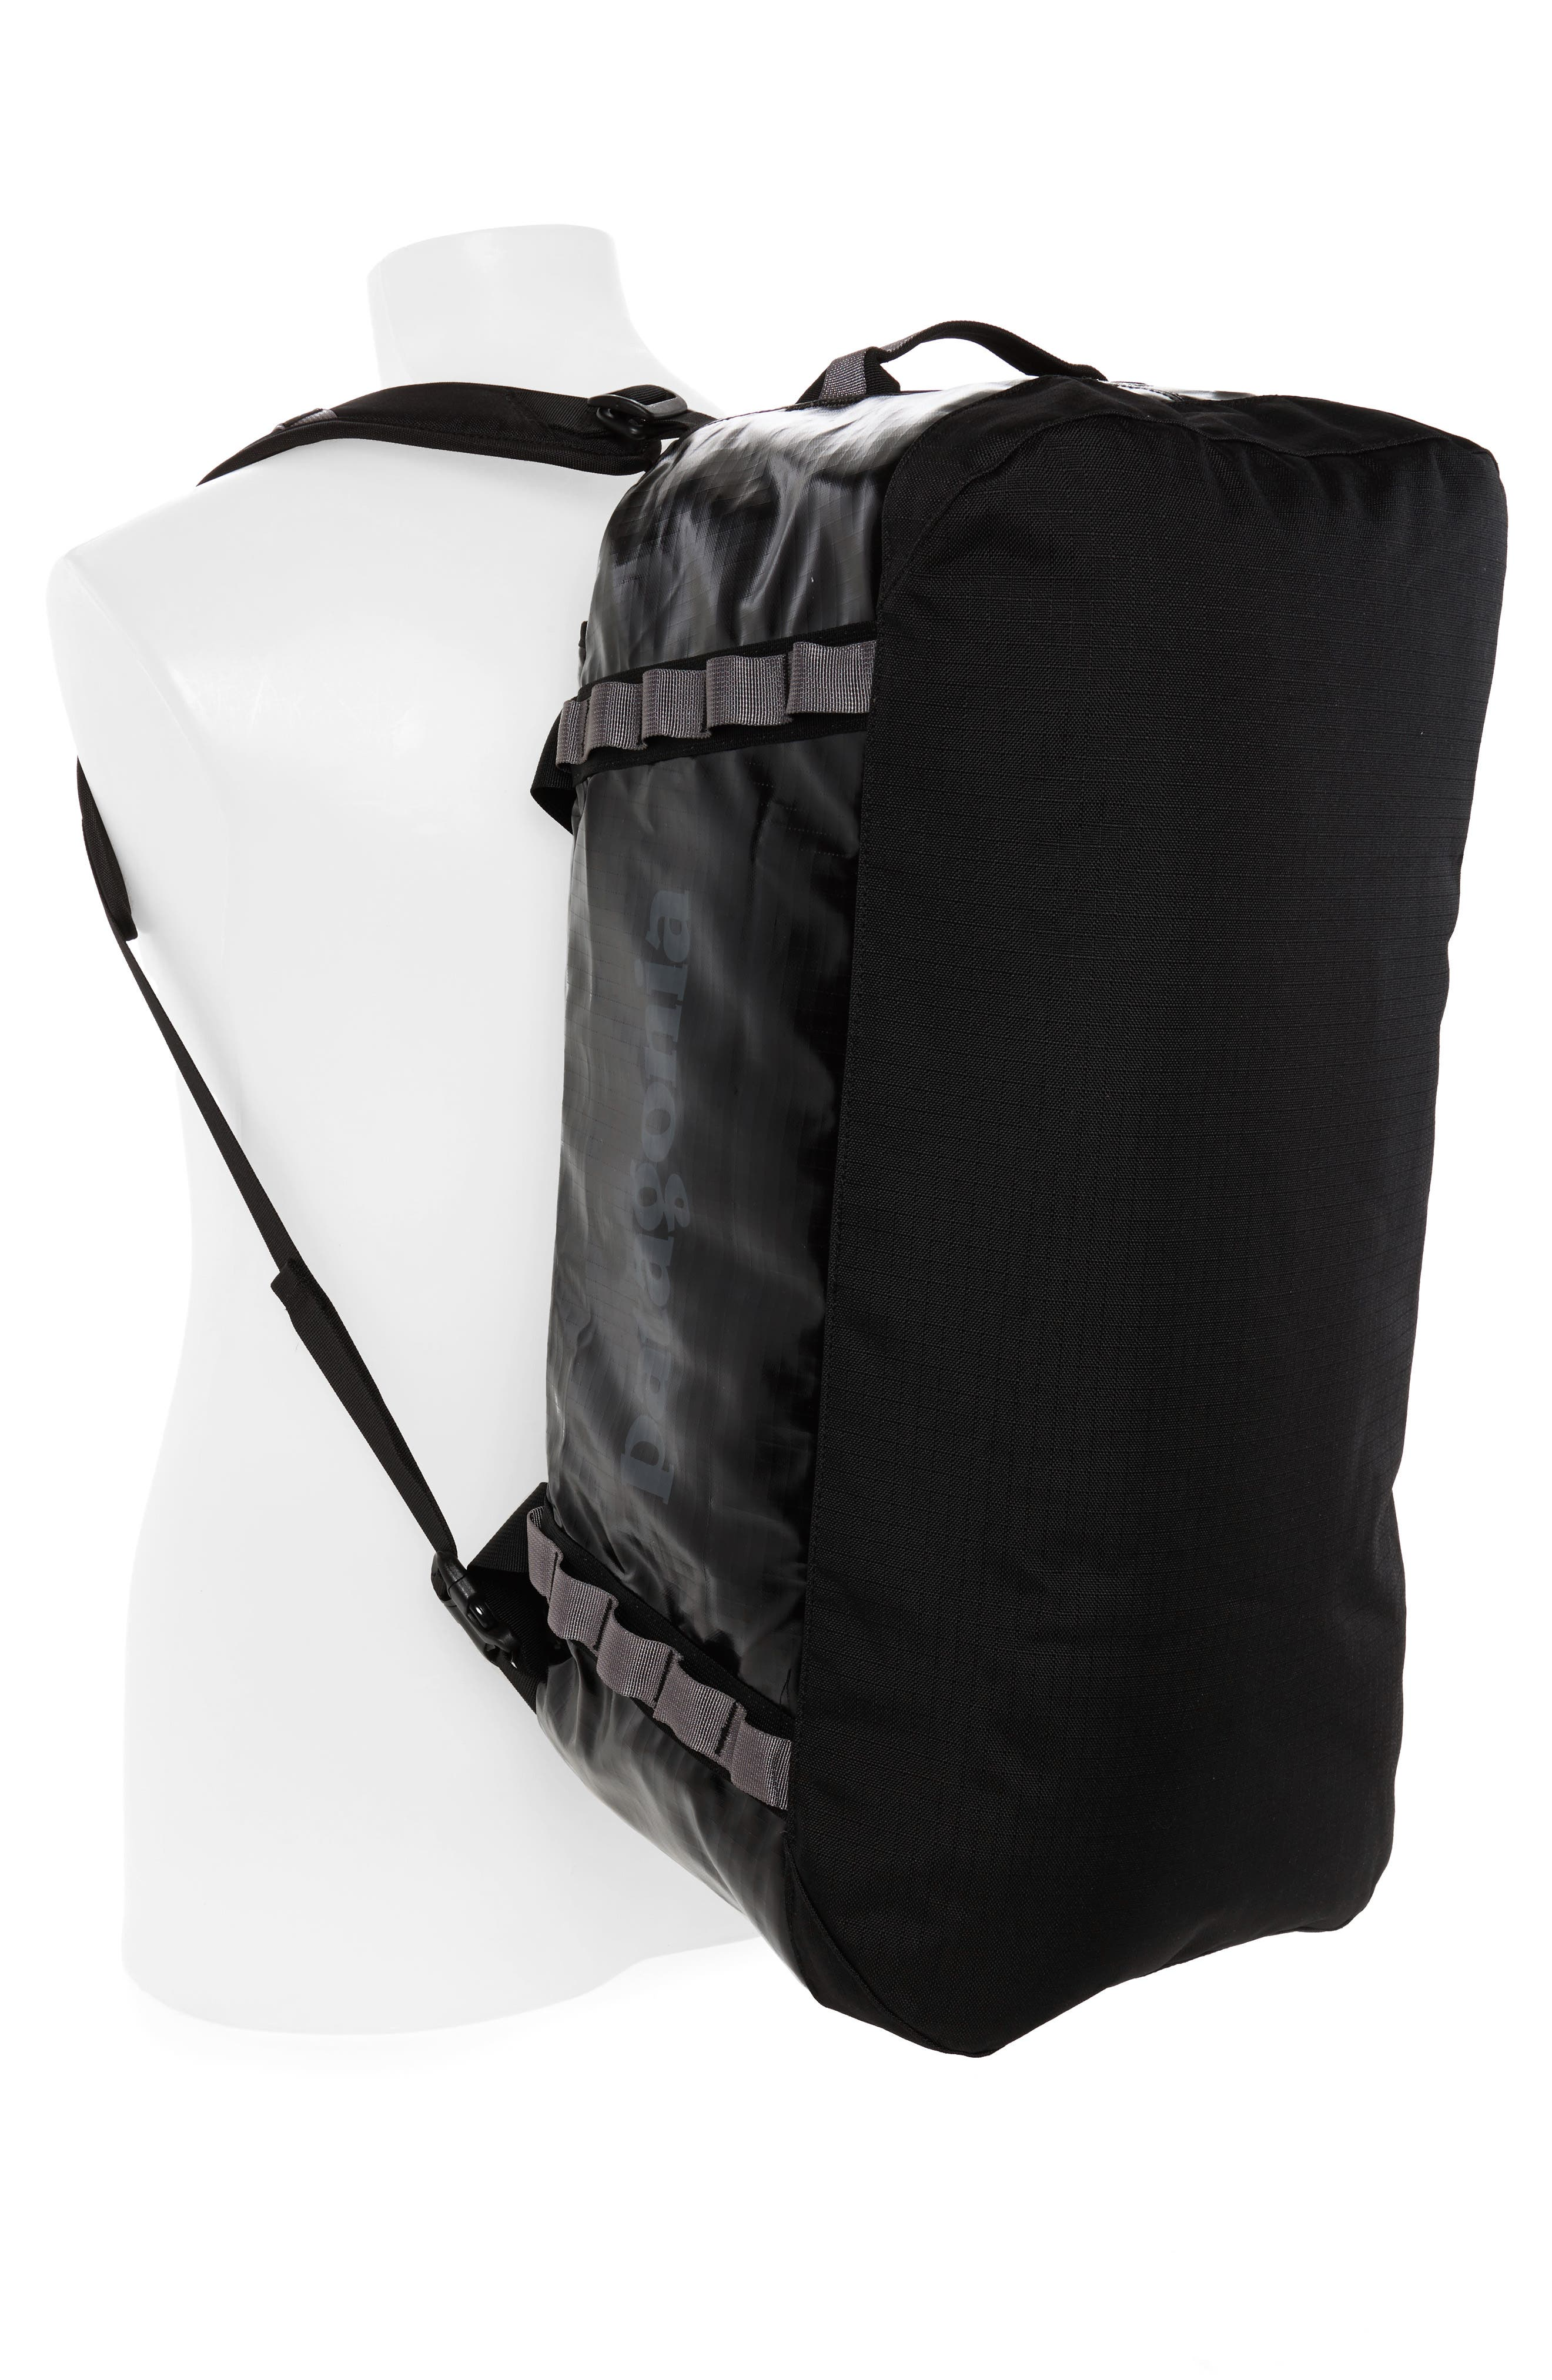 Black Hole Water Repellent Duffel Bag,                             Alternate thumbnail 2, color,                             001